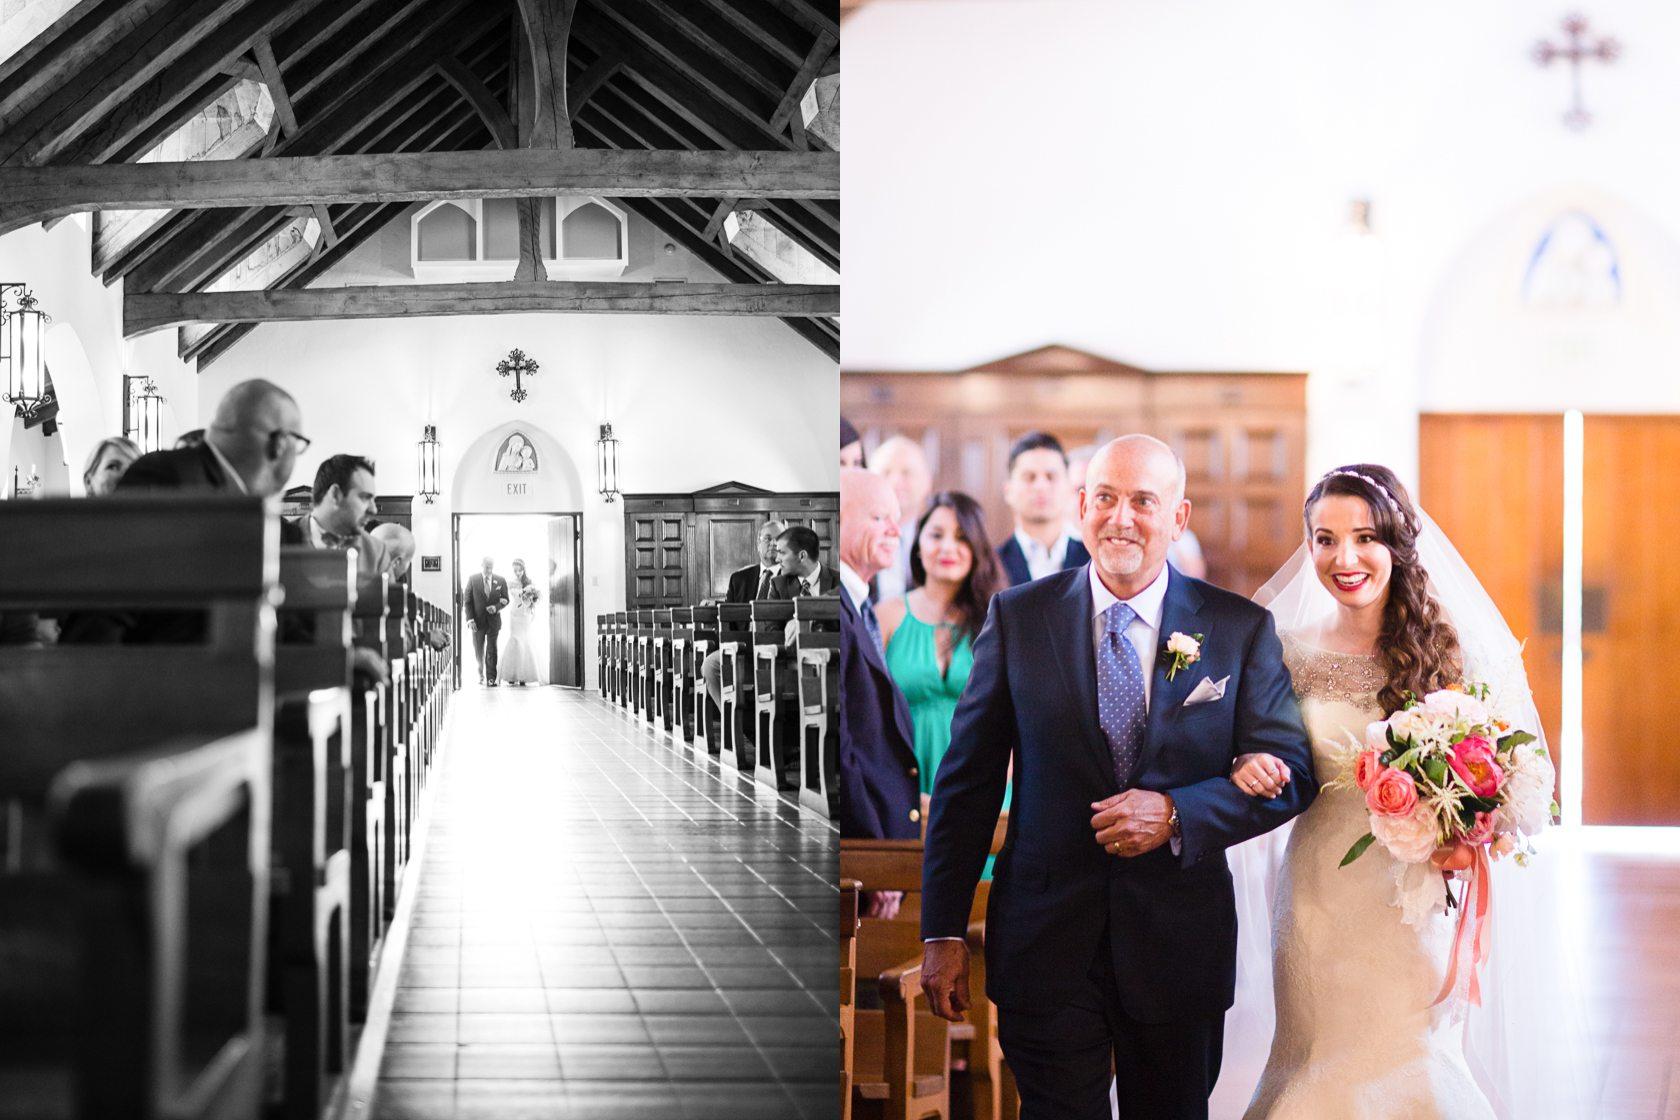 Darlington_House_Wedding_055.jpg